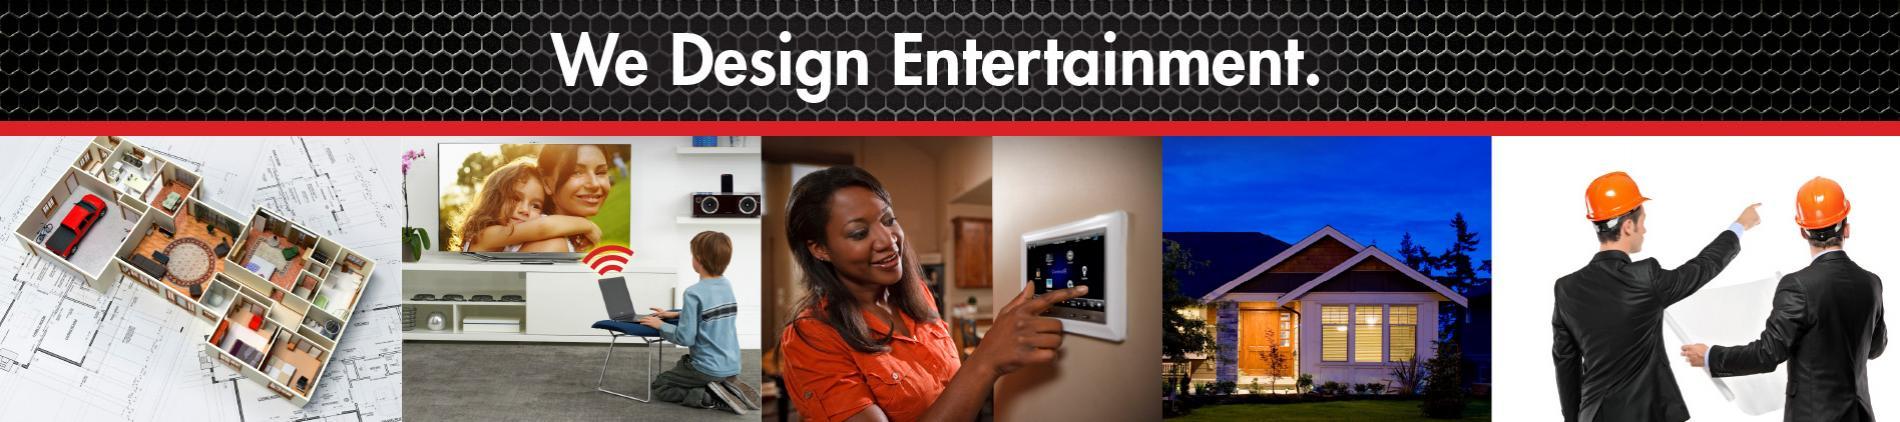 We Design Entertainment